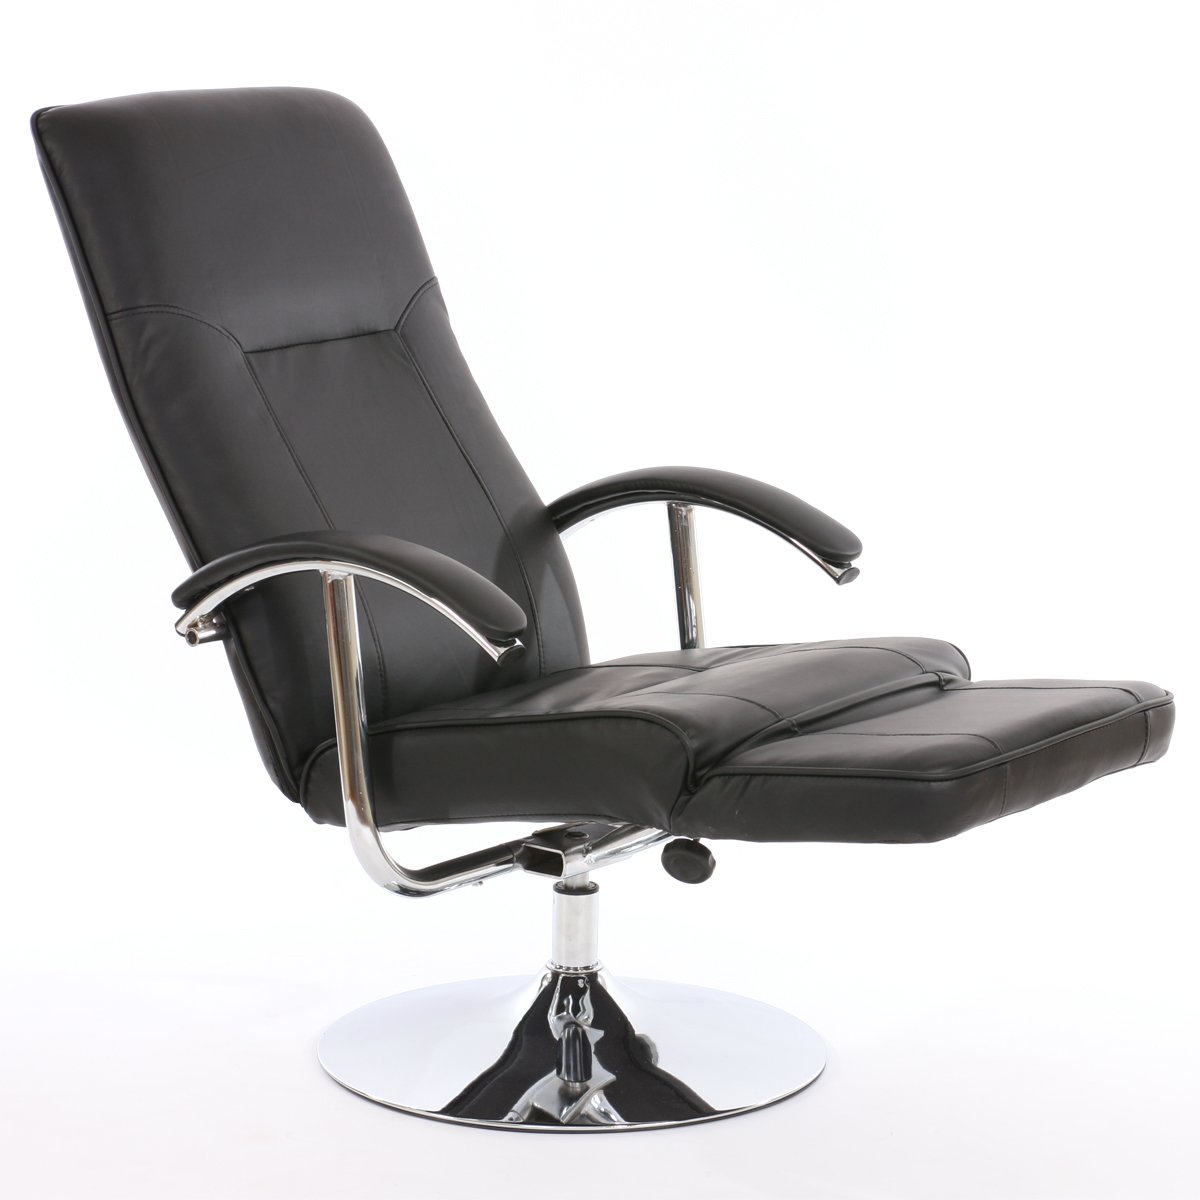 Sill n relax reclinable modelo apia ii en piel color negro for Sillon relax de piel